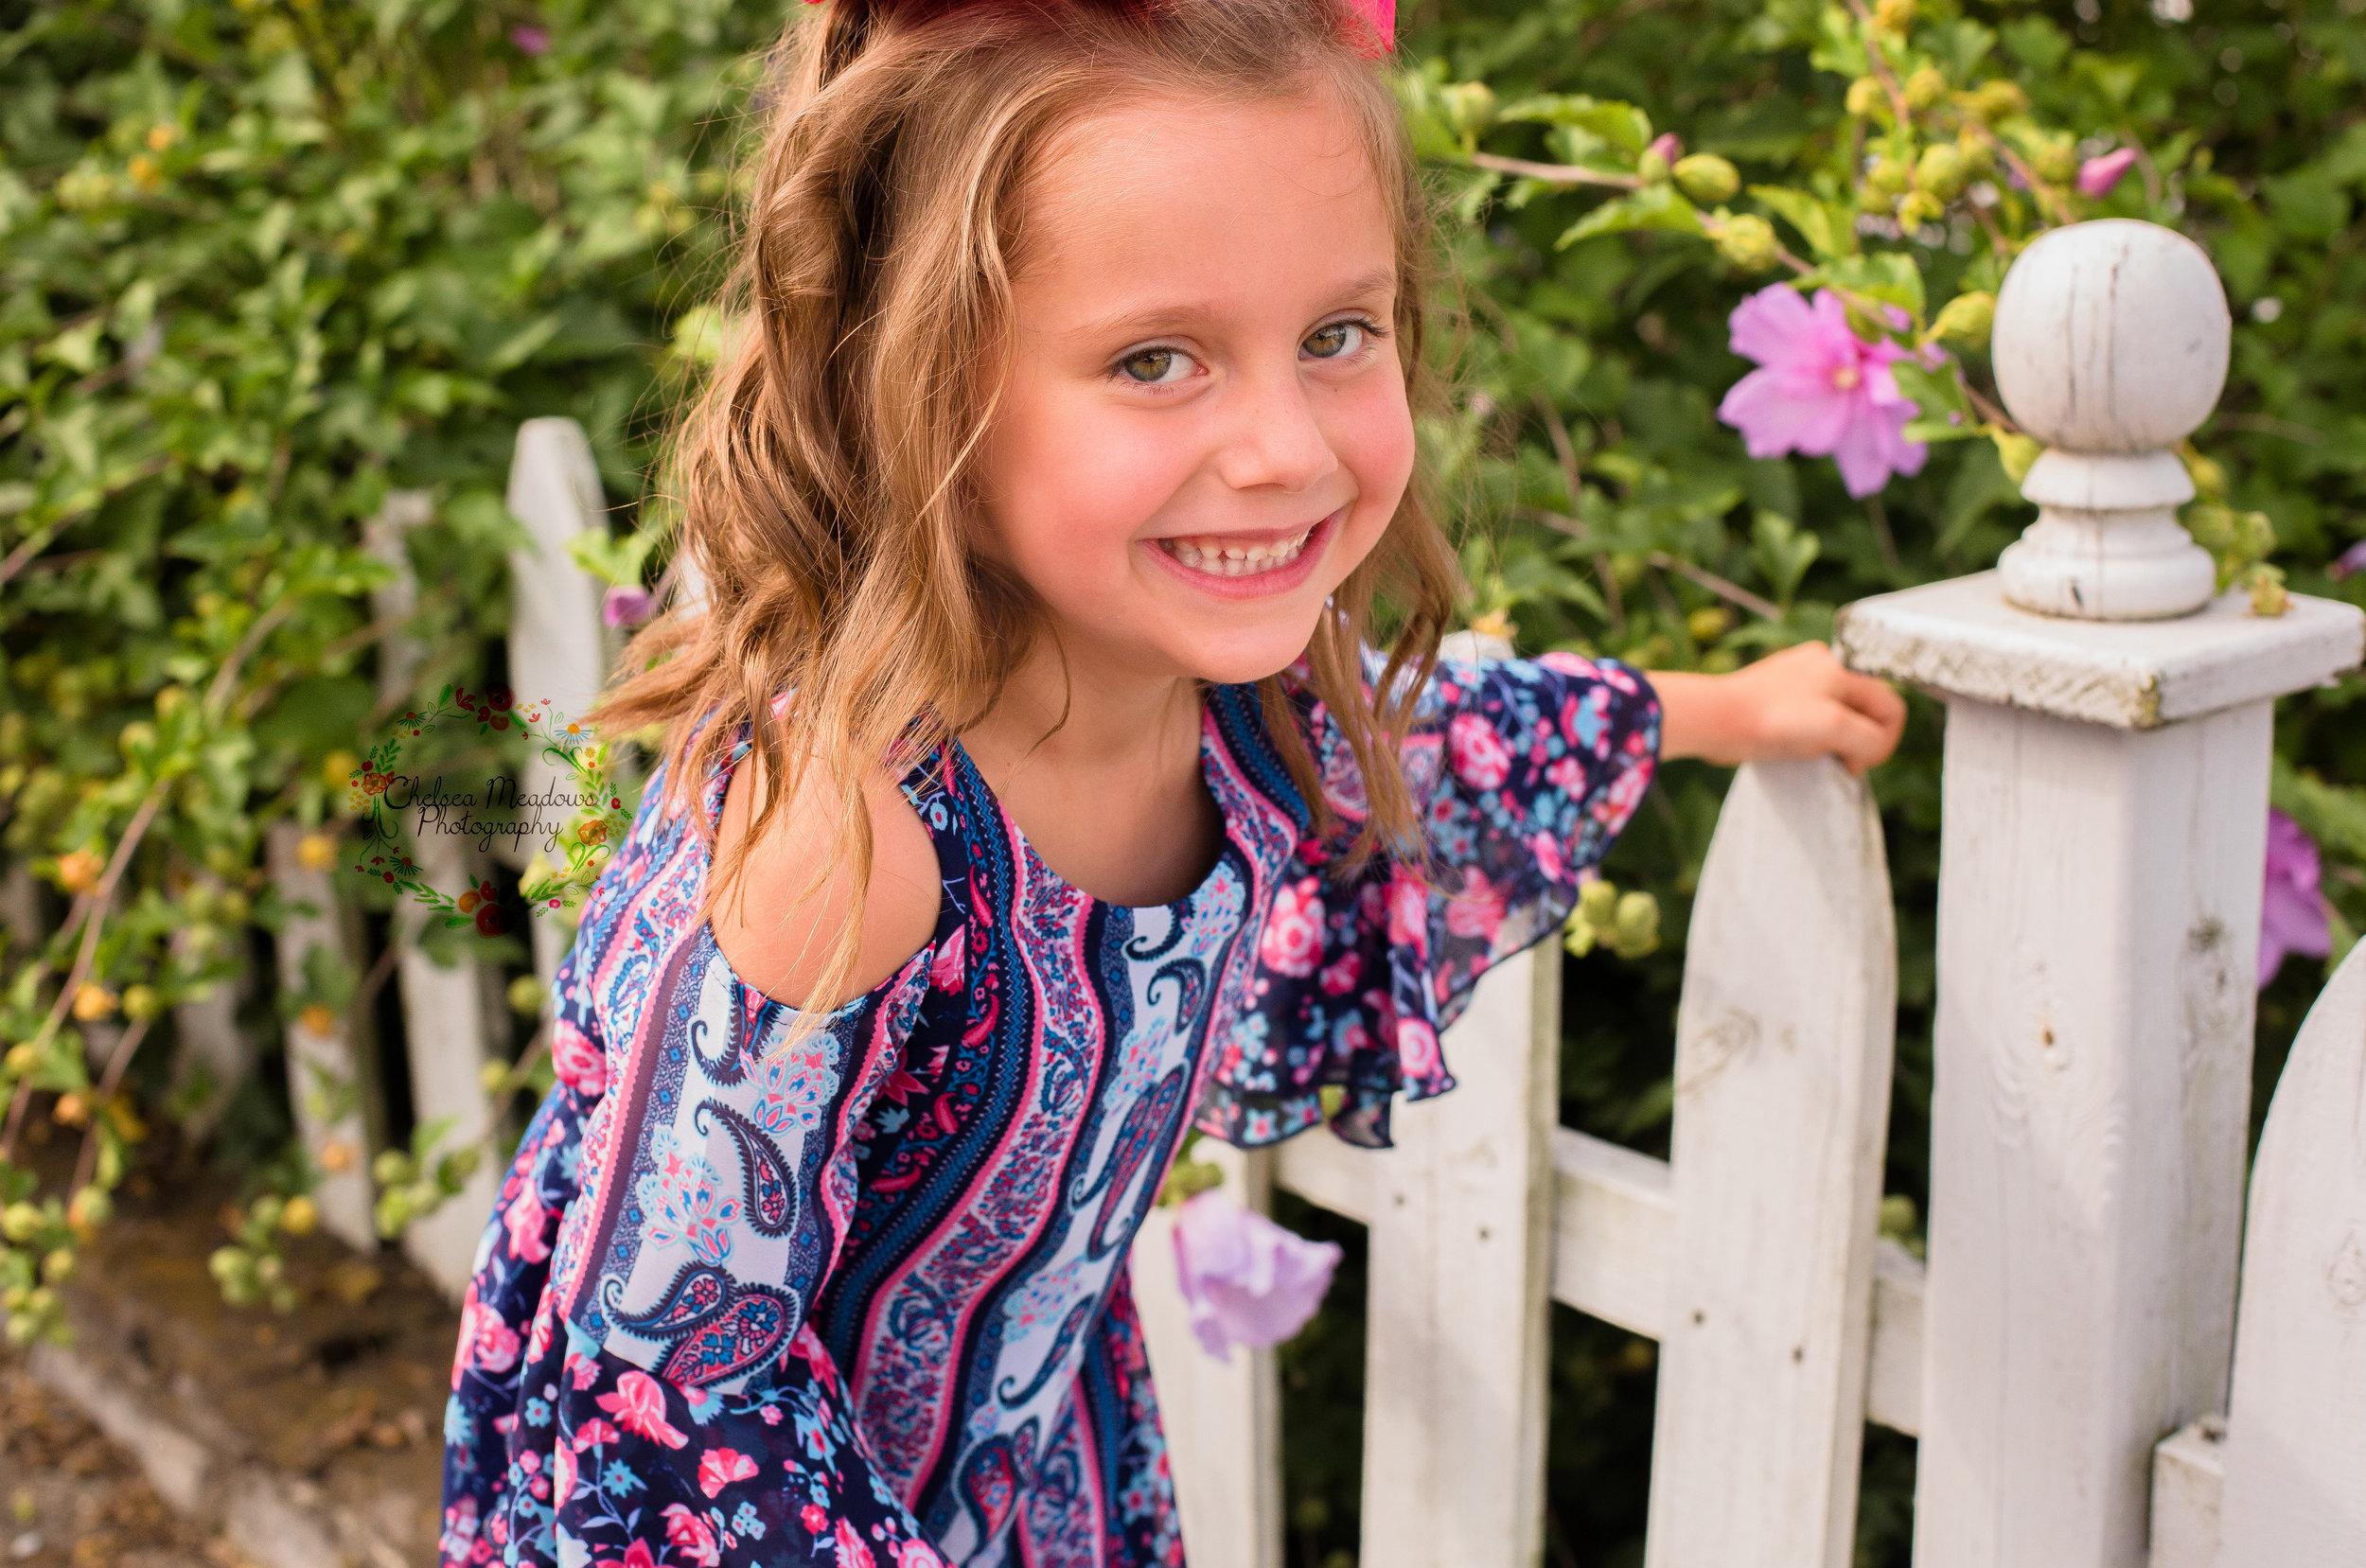 April 6th Birthday - Nashville Family Photographer - Chelsea Meadows Photography (12).jpg